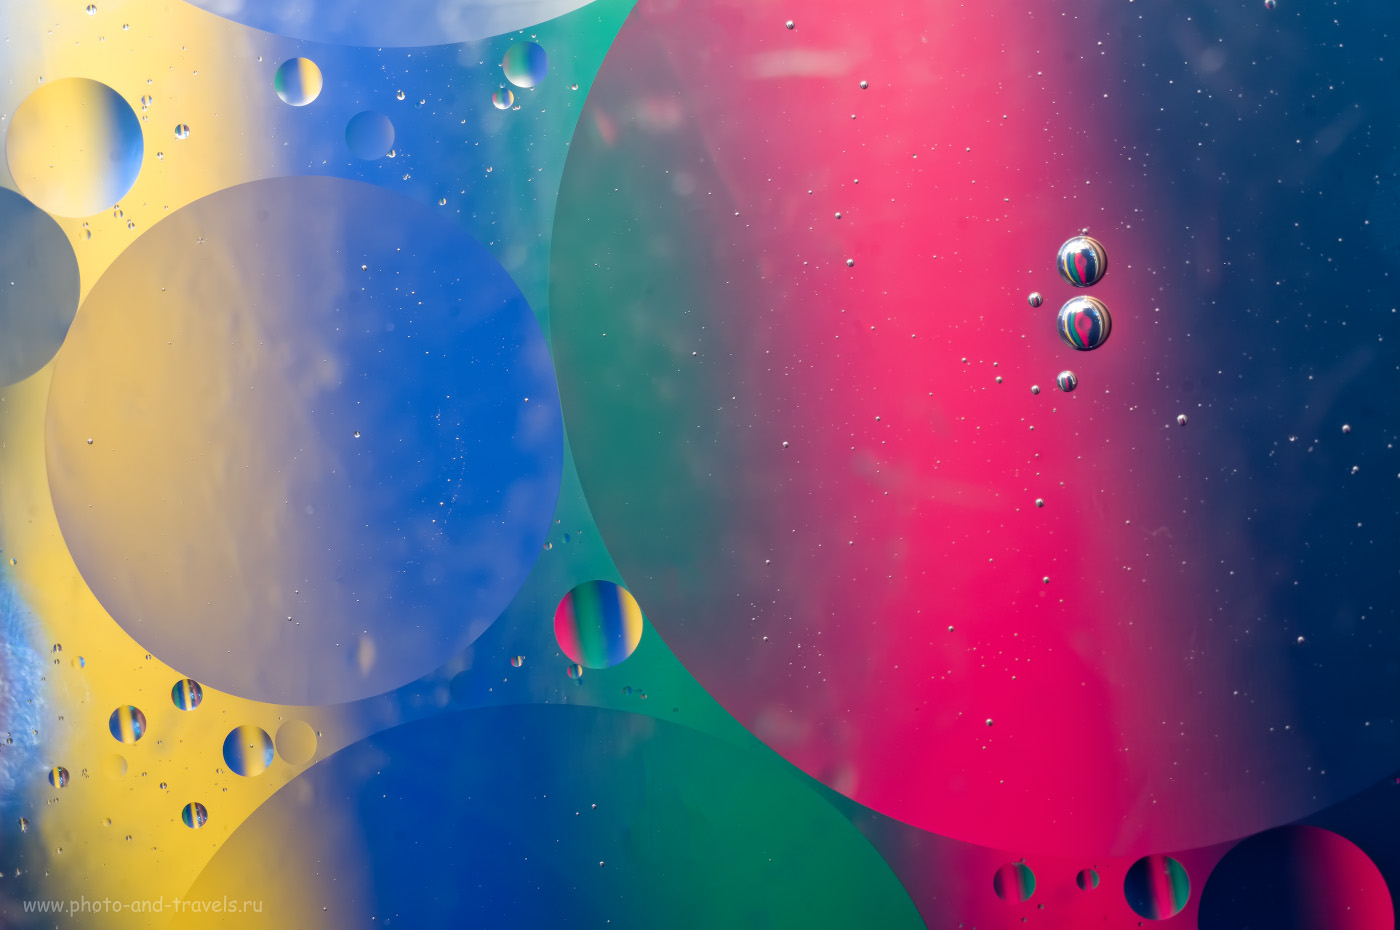 11. Пример съемки капель масла на воде на макрообъектив Вега 11У с тушкой Fujifilm X-T10. Освещение - от вспышки Yongnuo YN-685N, управляемой с трансмиттера YN-622N-TX. Настройки: 1/180, 200, 75, 50.